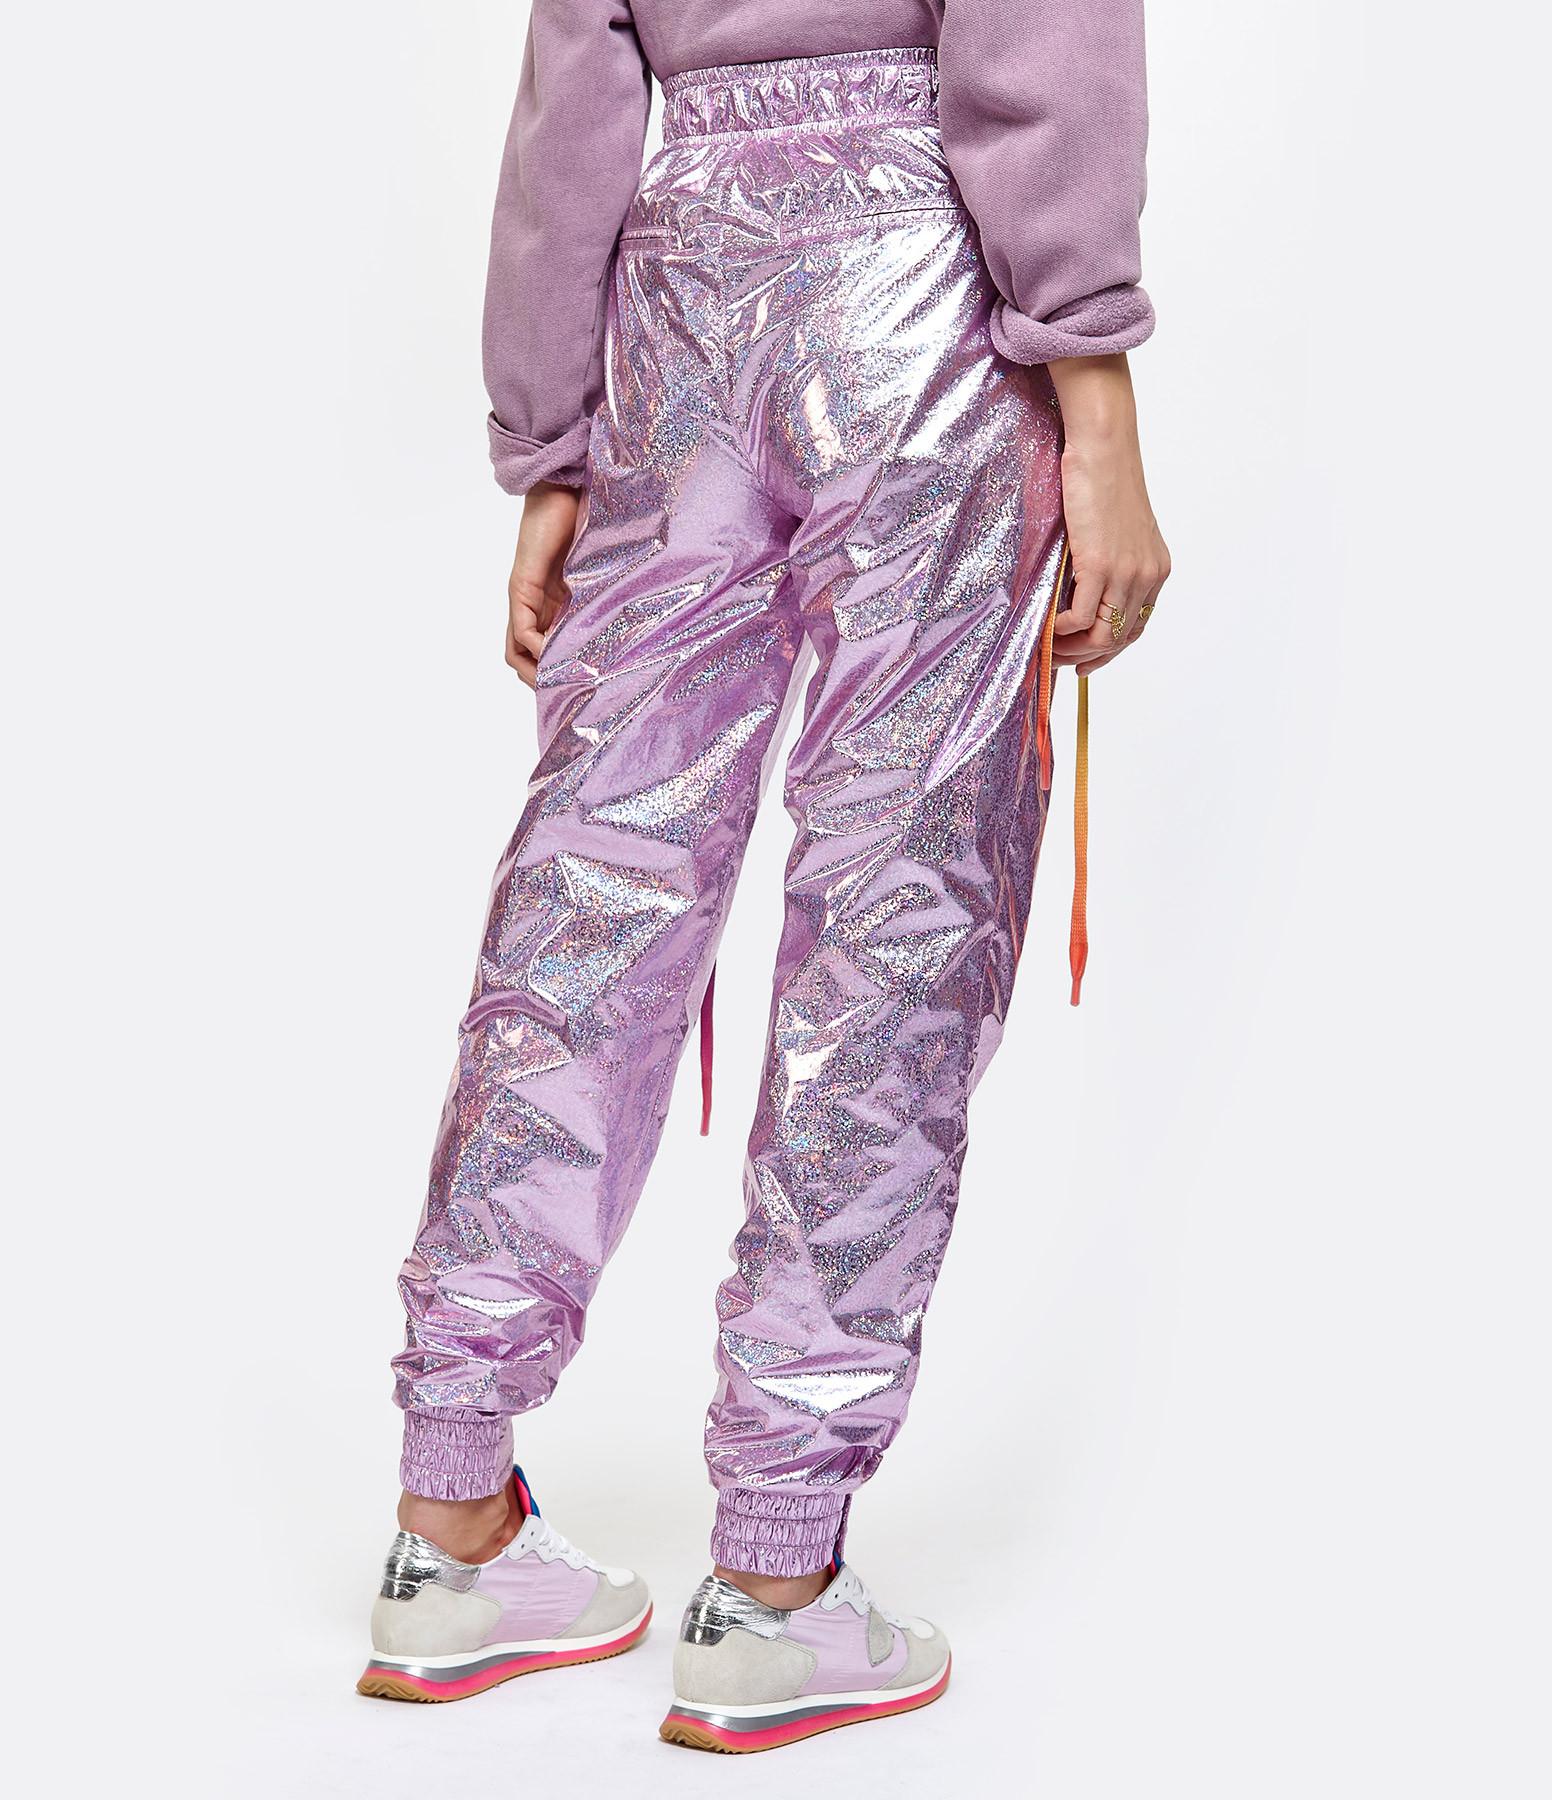 KHRISJOY - Pantalon Drawstring Rose Confetti